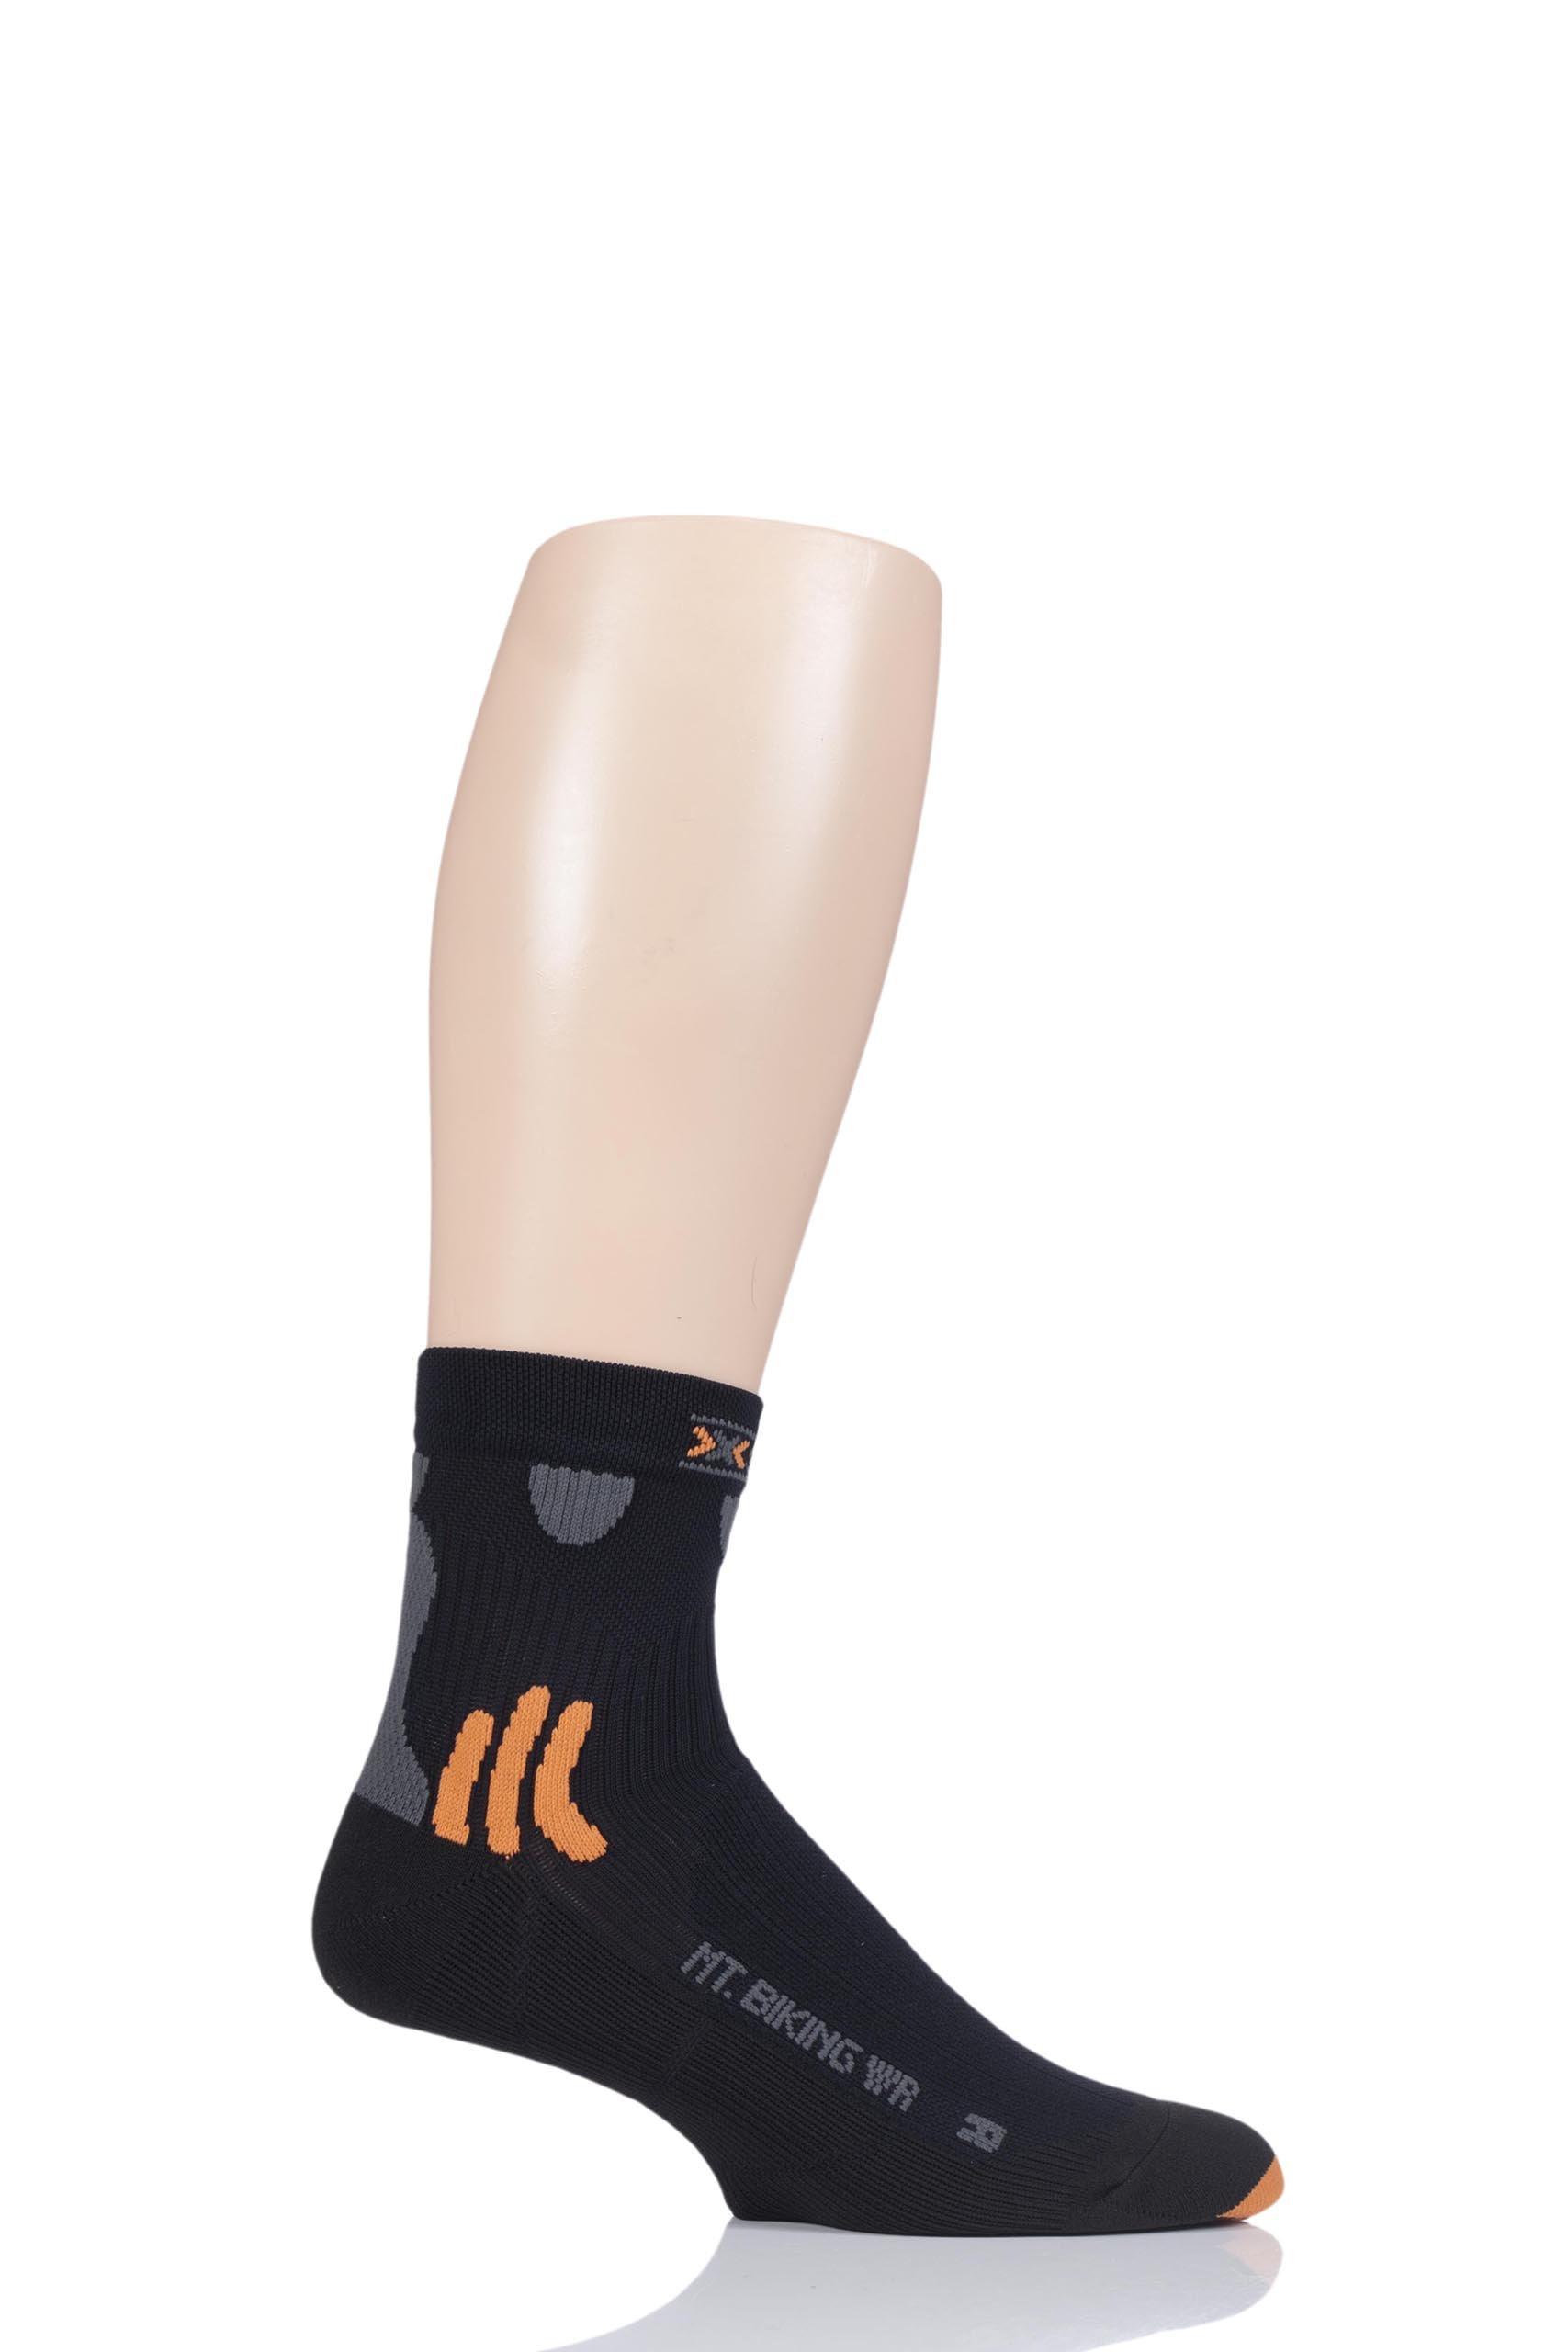 X-Socks Mountainbiking Short Water-repellent Black, Size:45/47